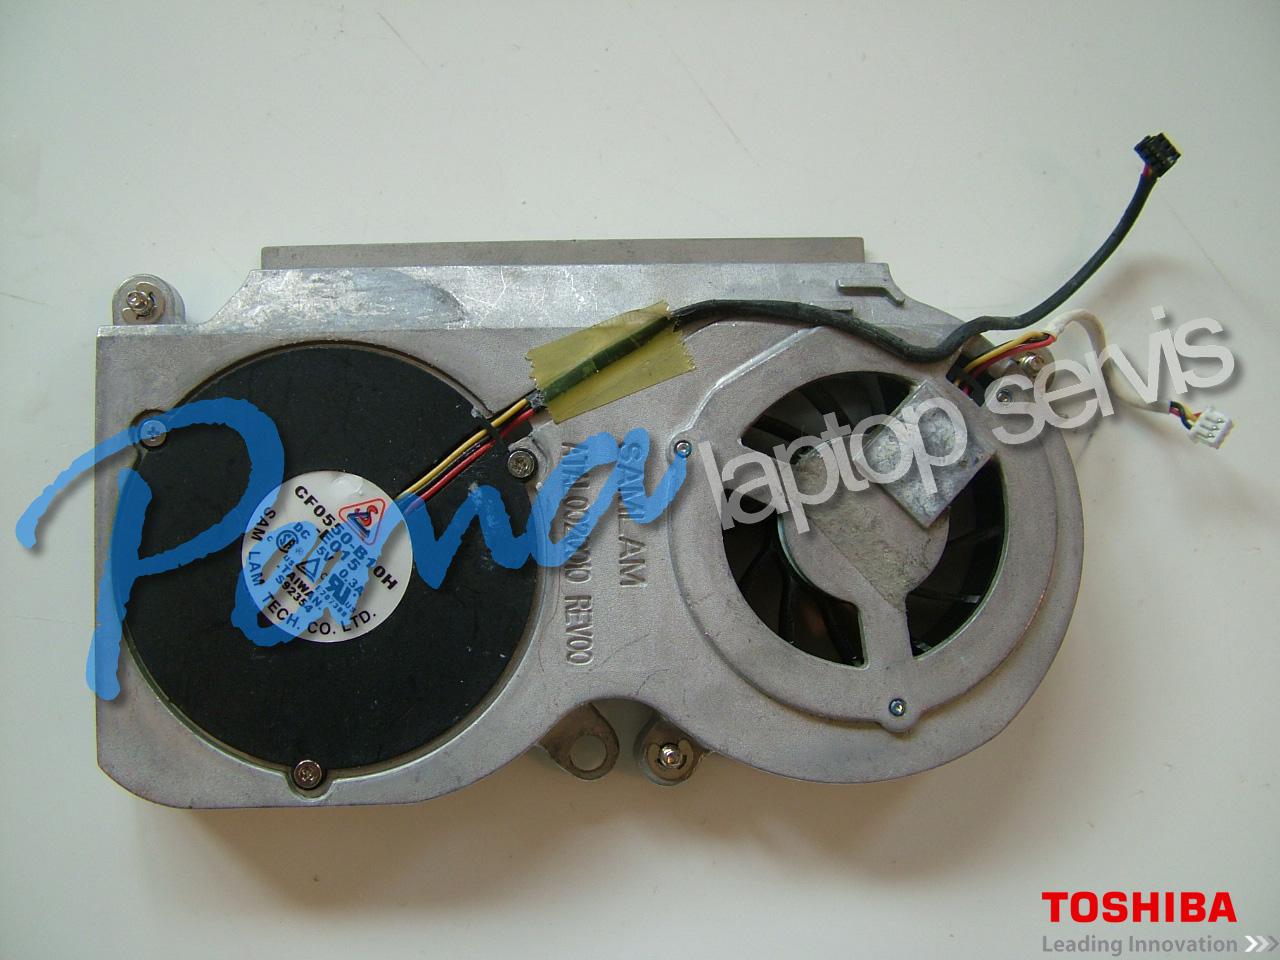 Toshiba Satellite P10 fan